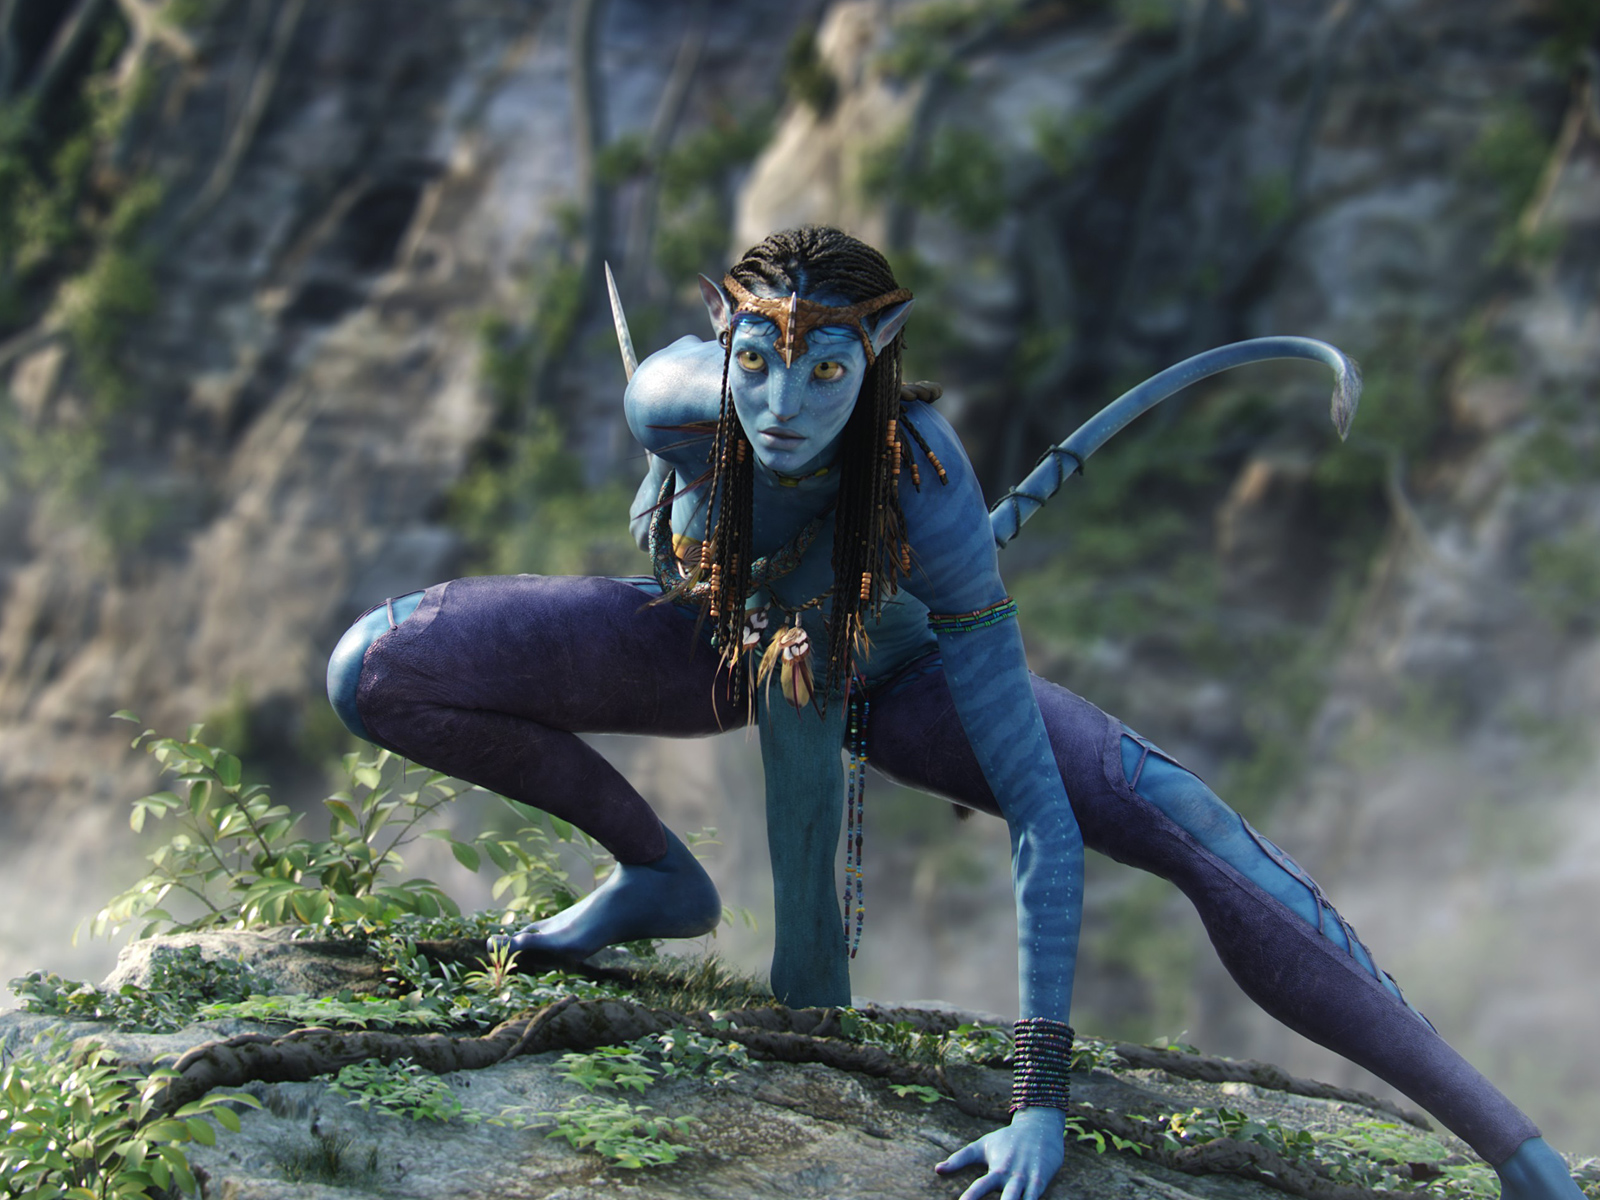 Джеймс Кэмерон назвал дату начала съемок новых частей Аватара